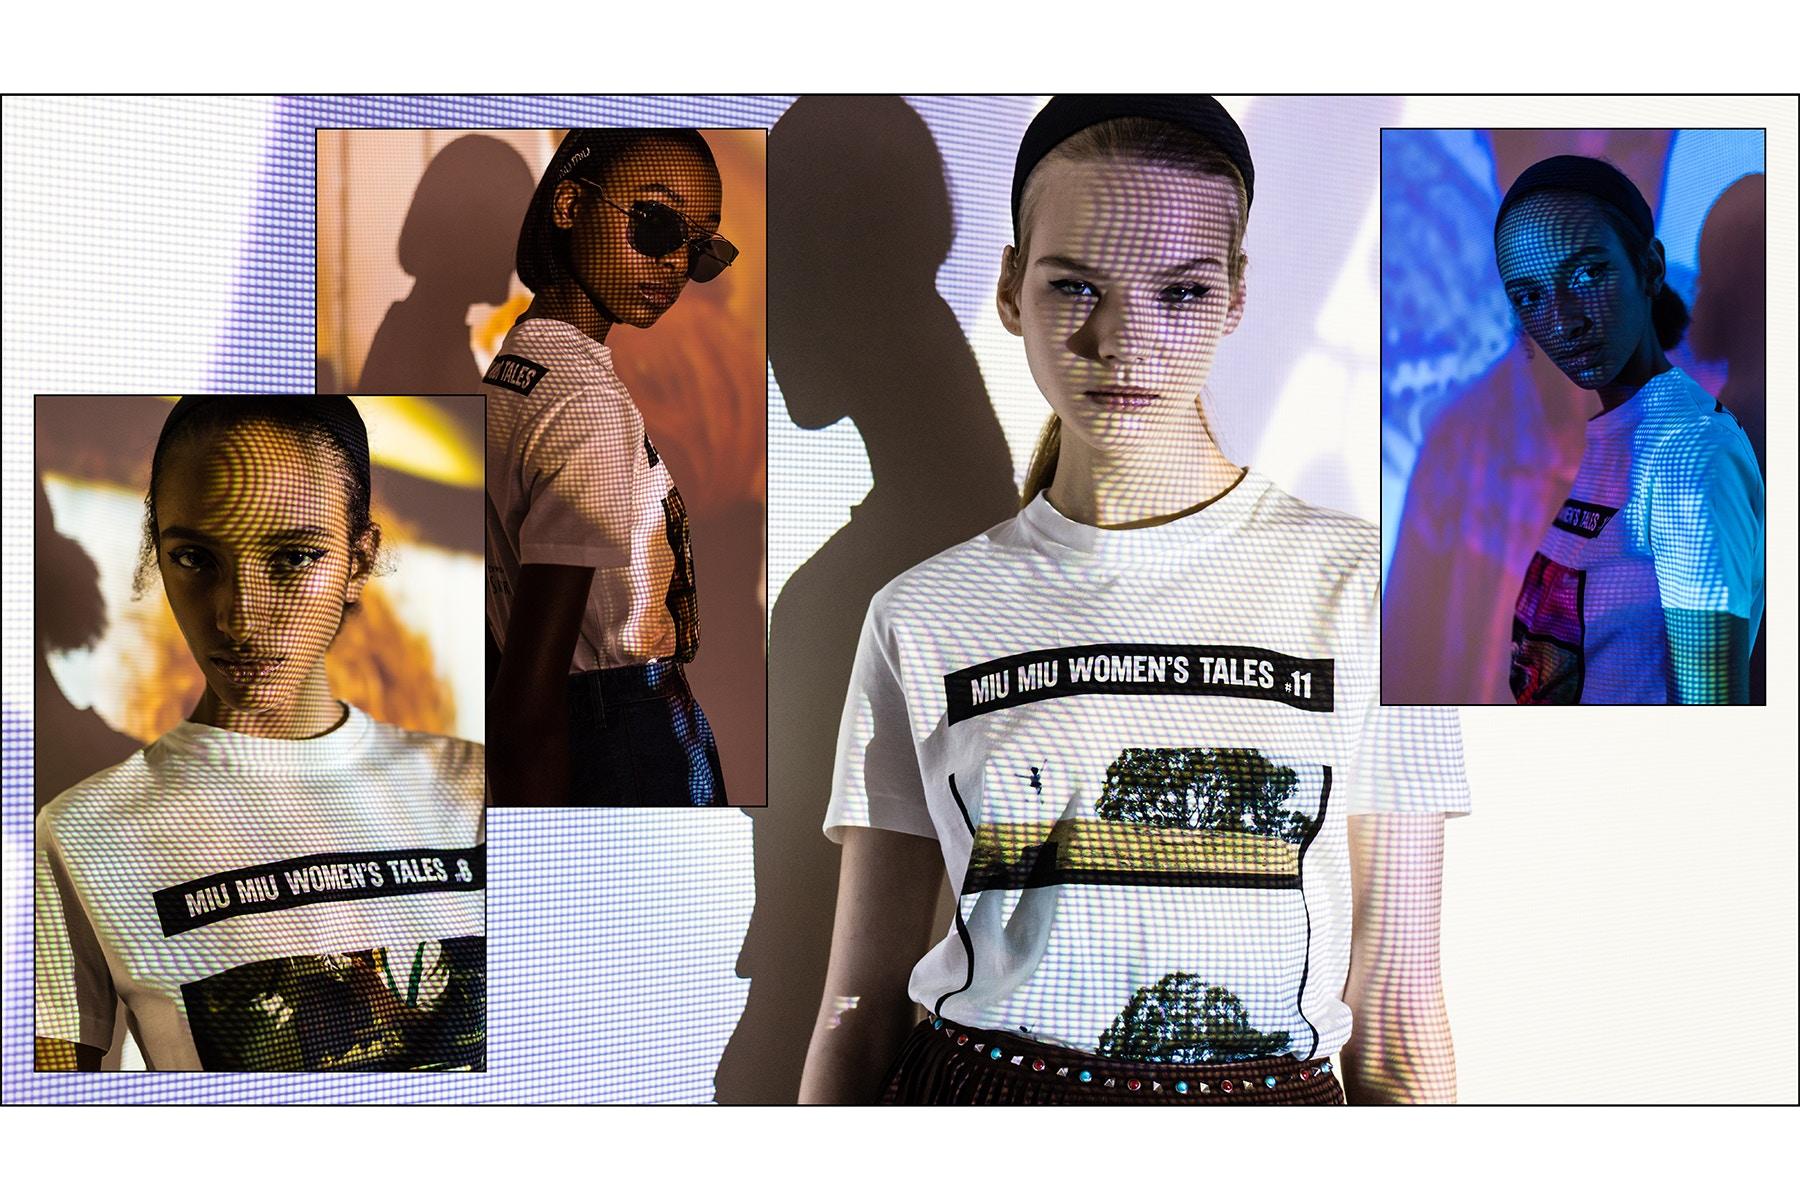 miu-miu-womens-tales-tshirts-limited-edition-3